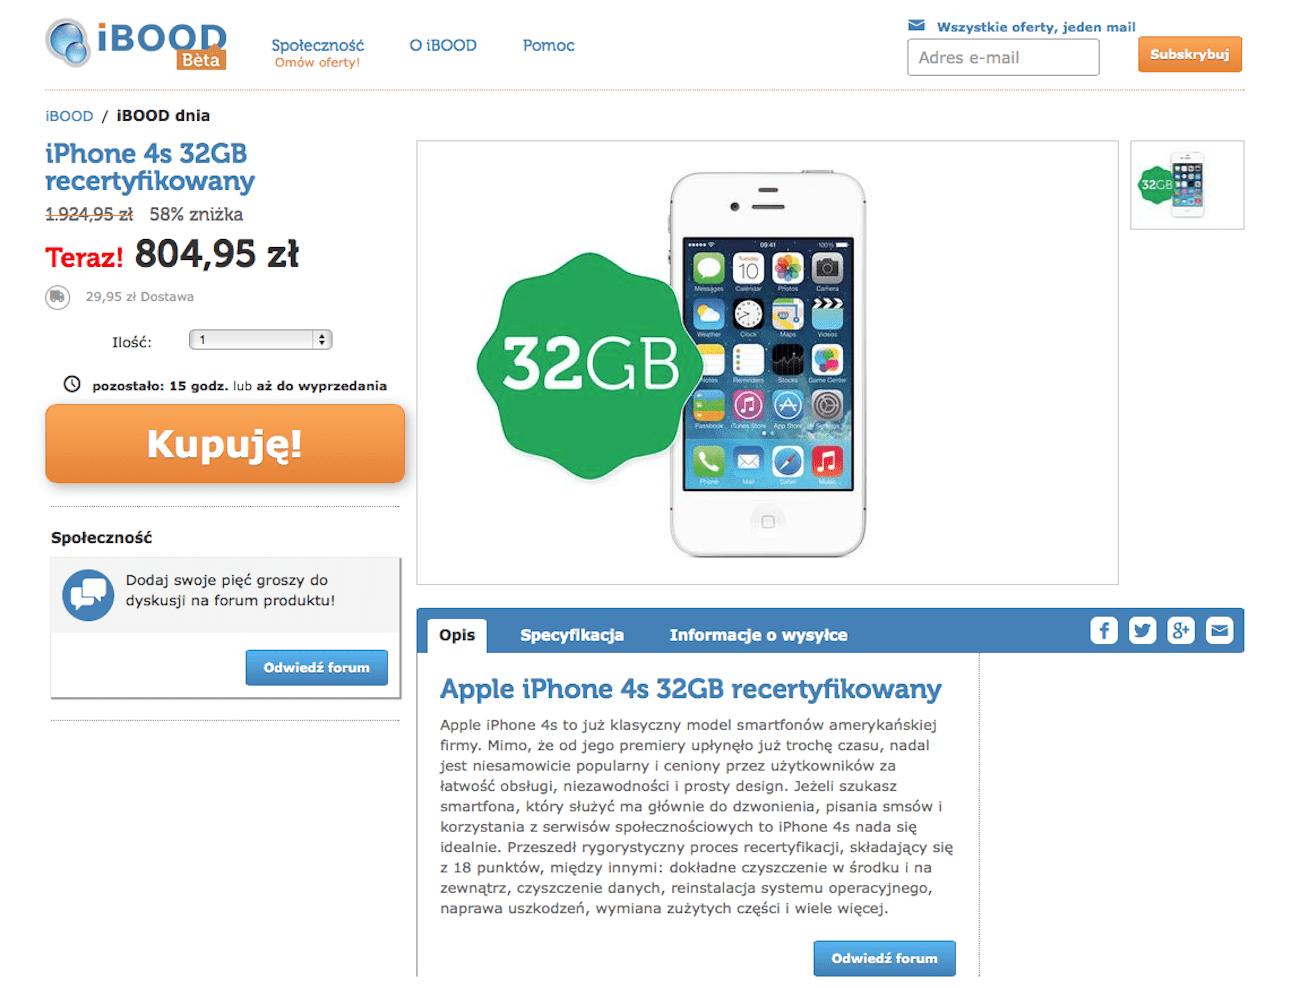 Zrzut ekranu 2015-04-13 o 08.28.28